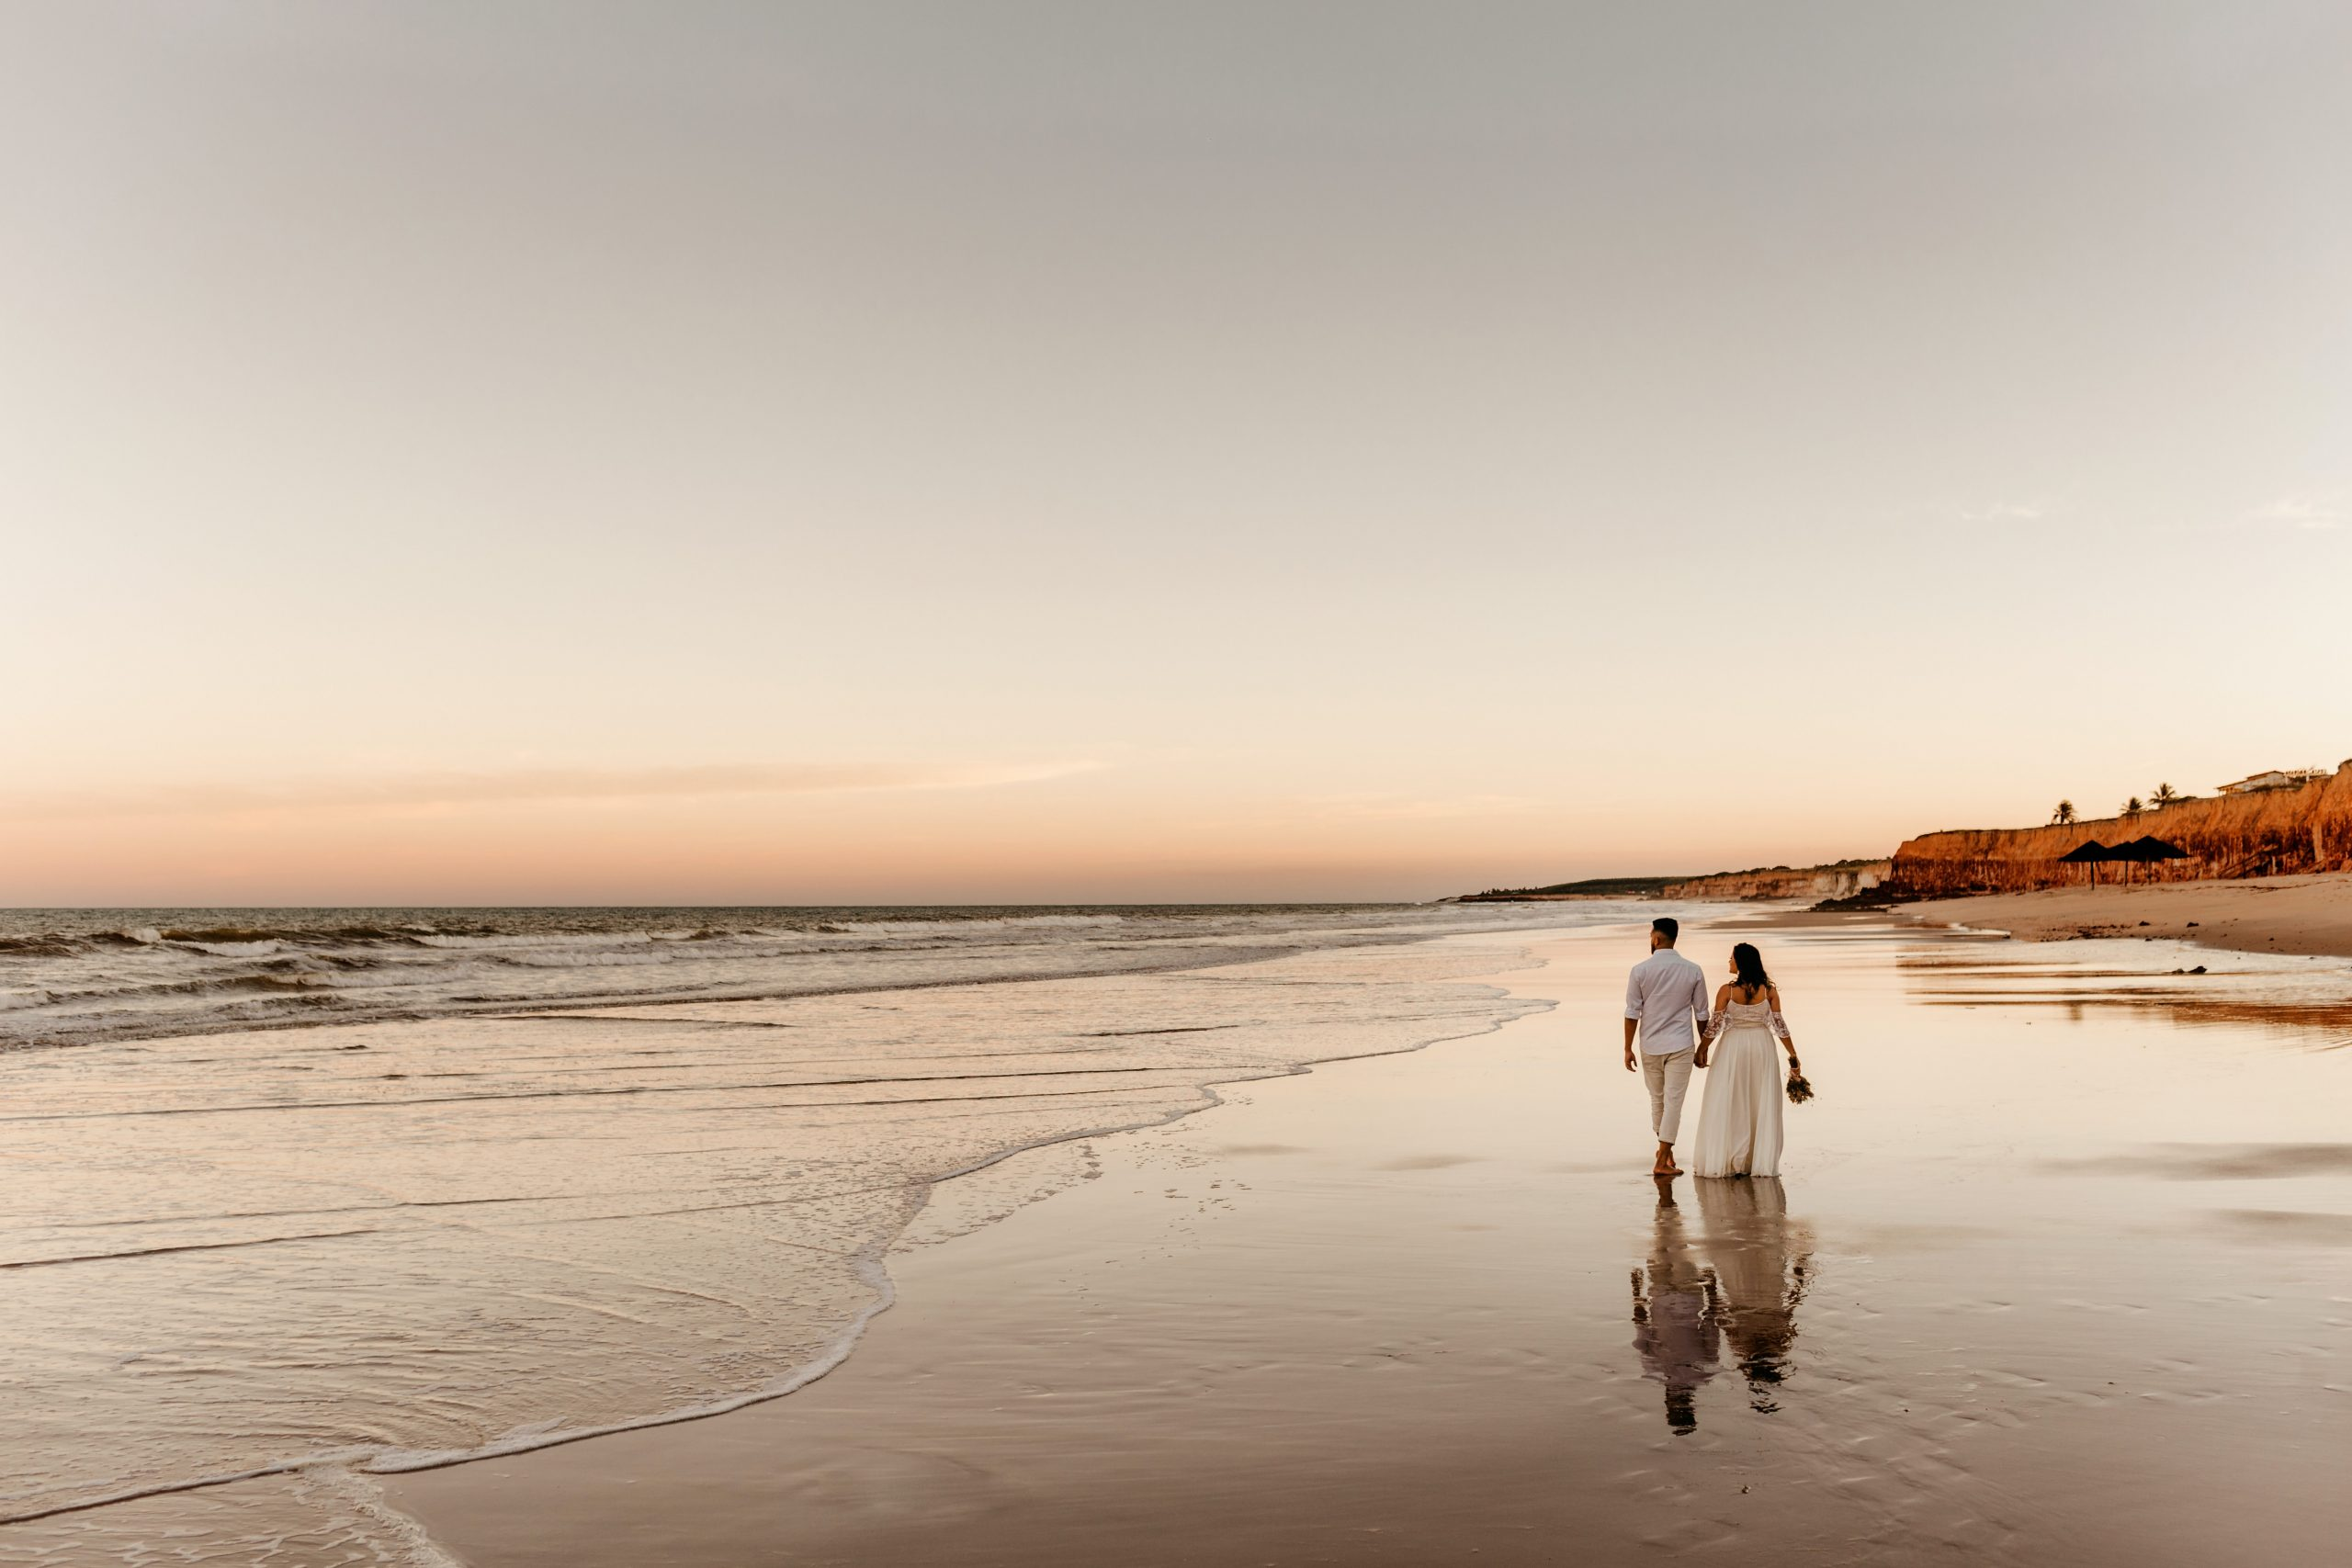 Beach Elopement Wedding - Jonathon Borba